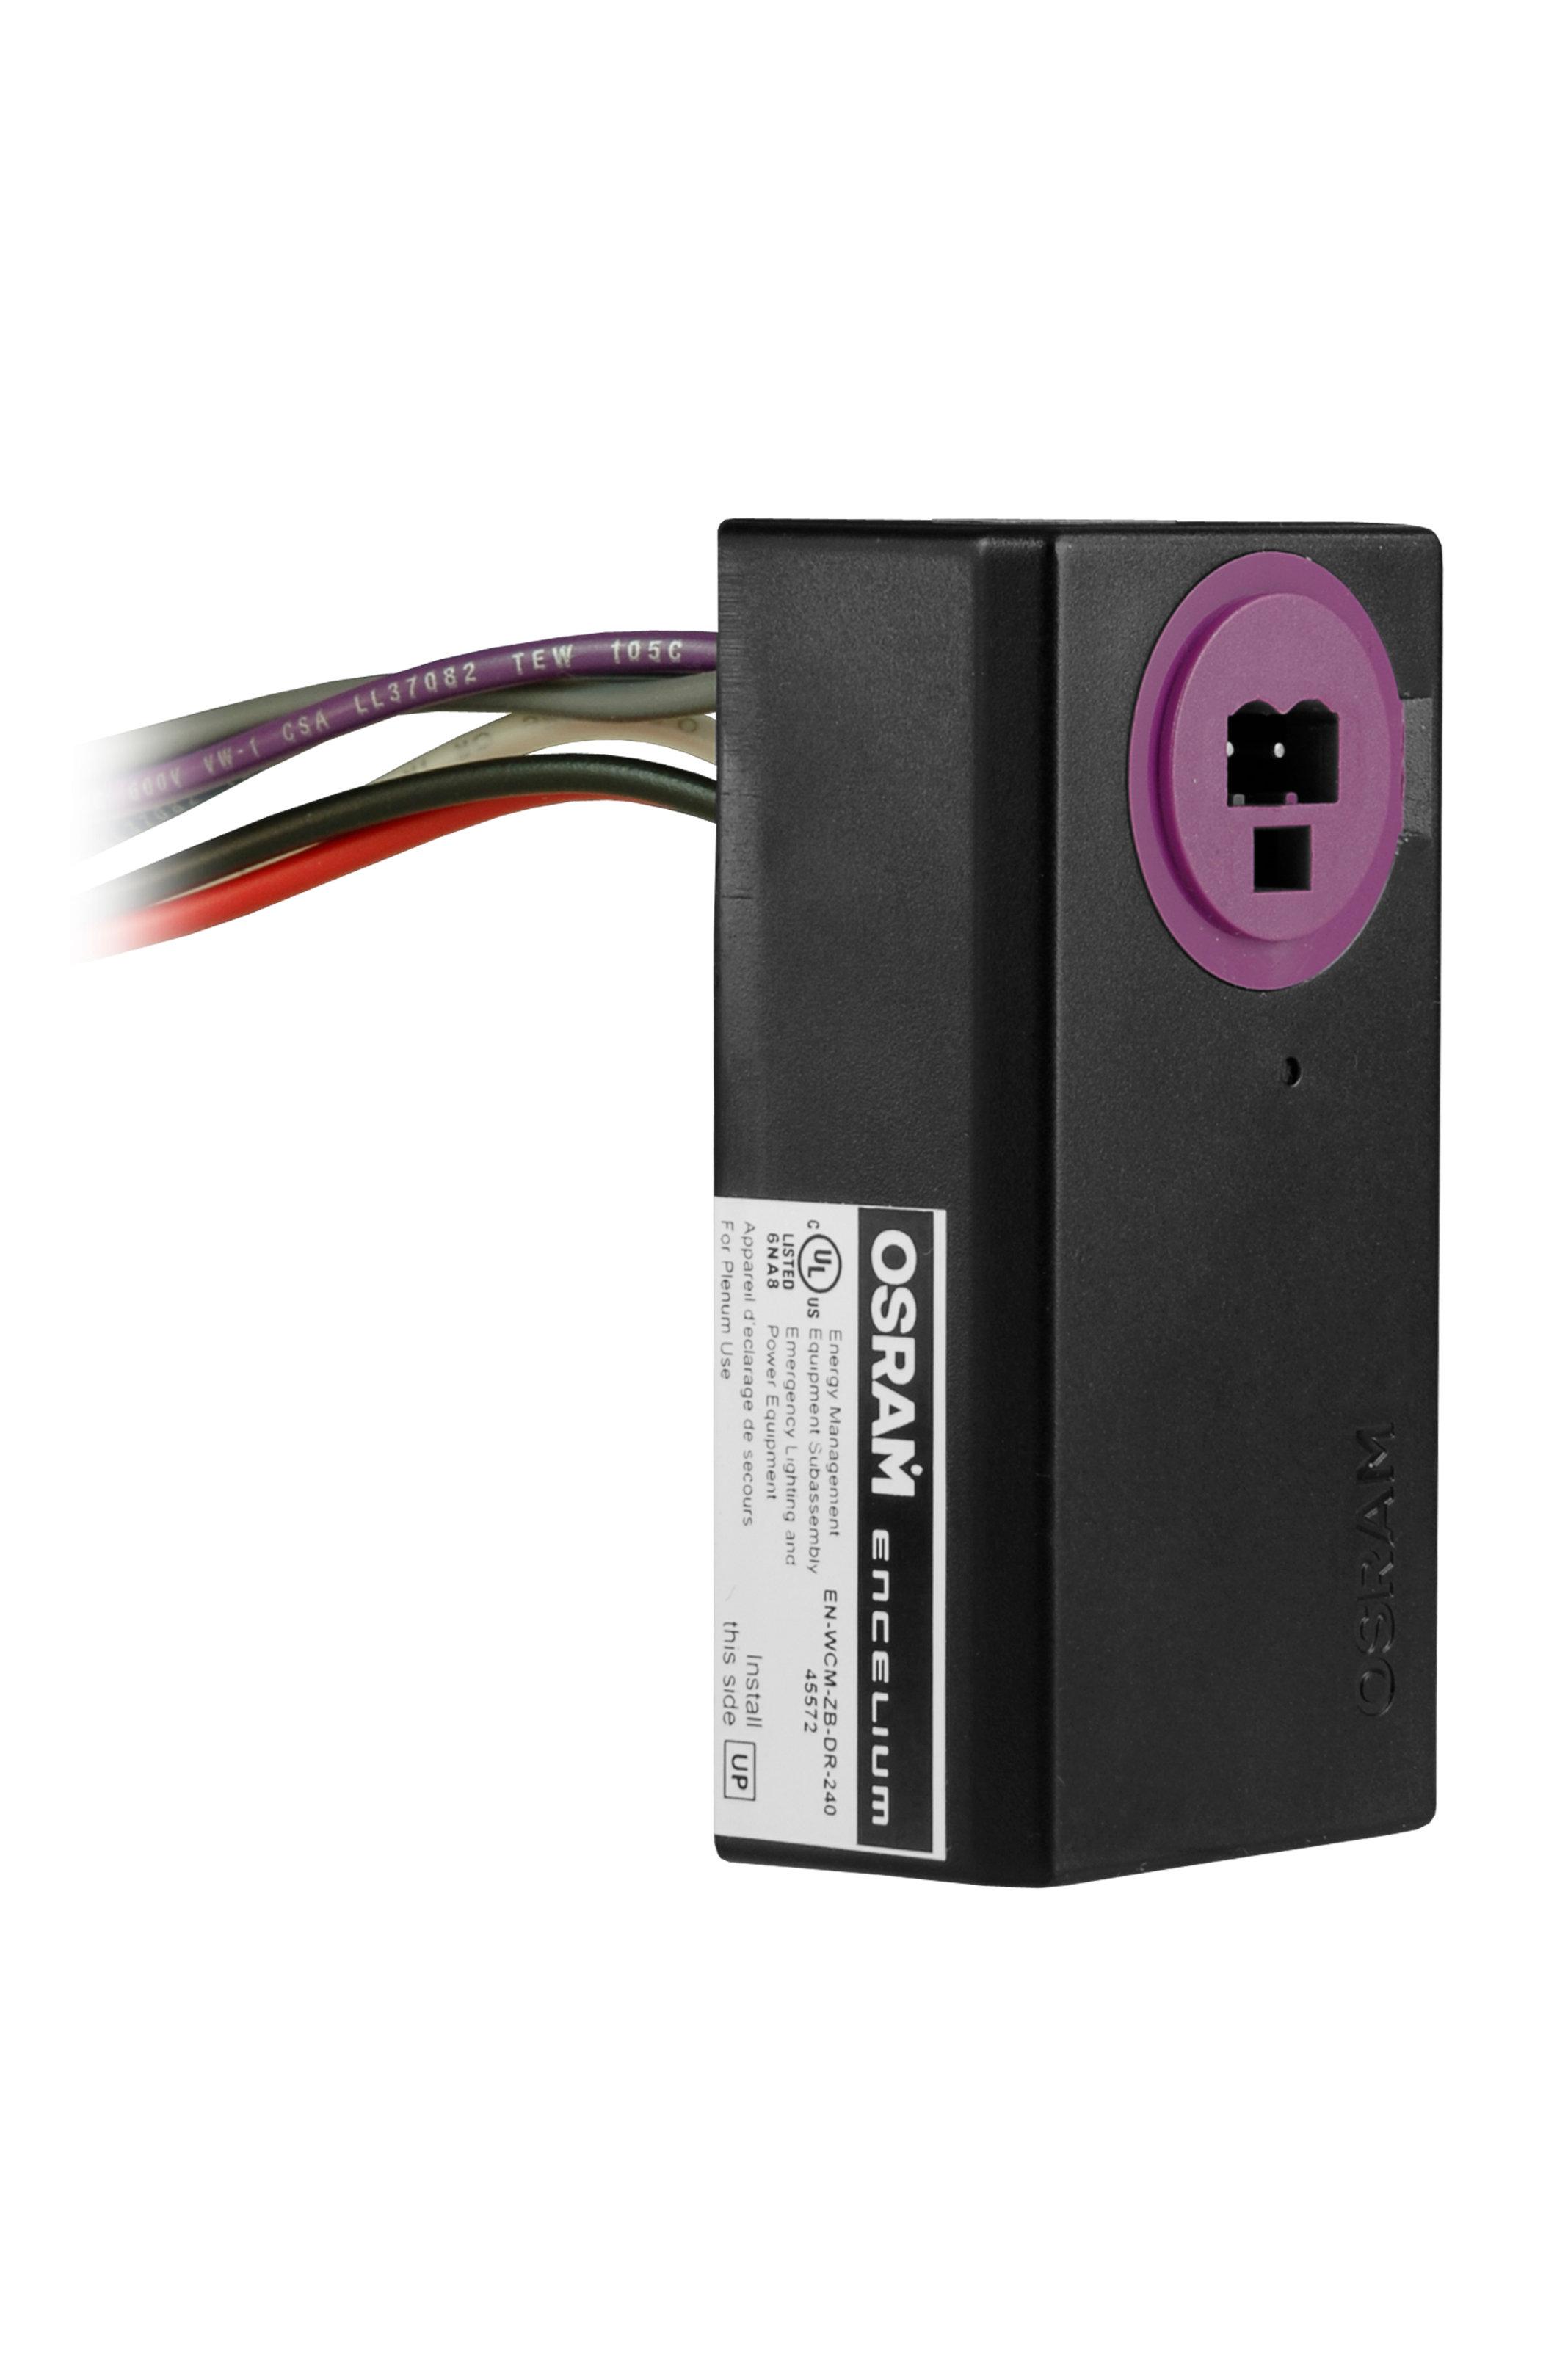 Wireless_Control_Module Foote encelium wiring diagram lighting management systems \u2022 edmiracle co  at honlapkeszites.co